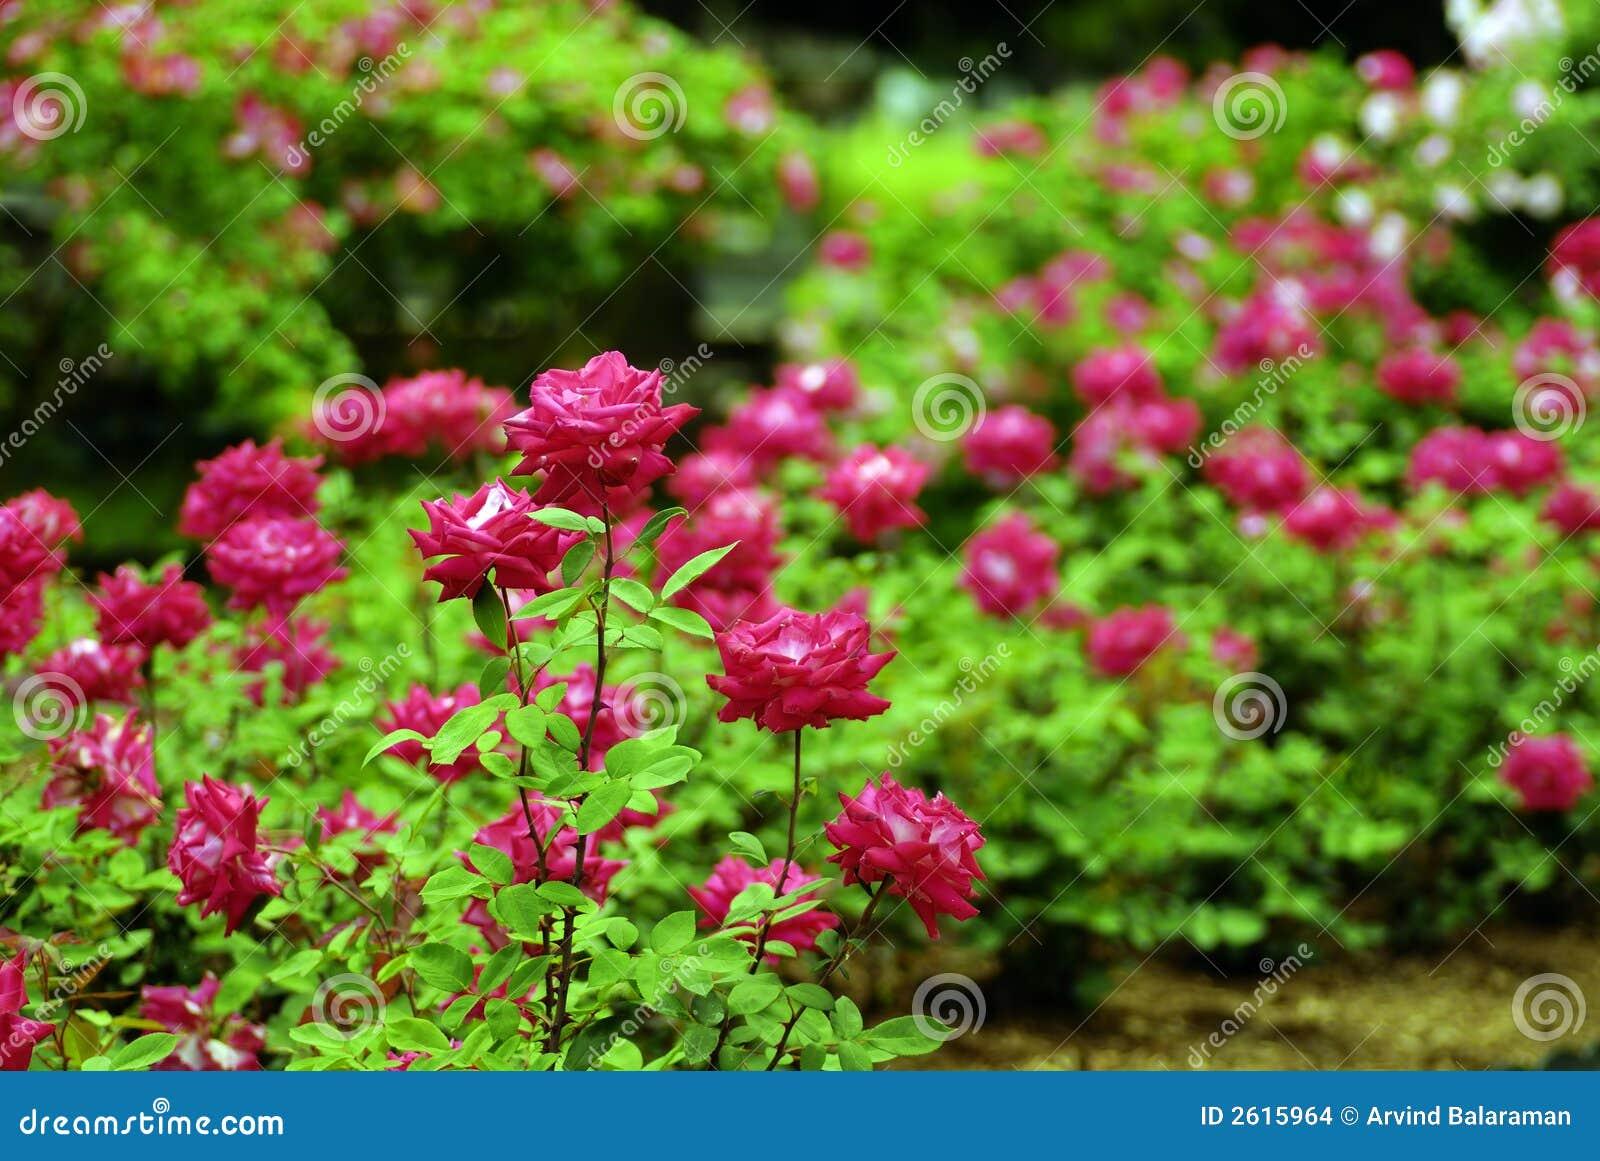 flores de jardim fotos:Rose Garden